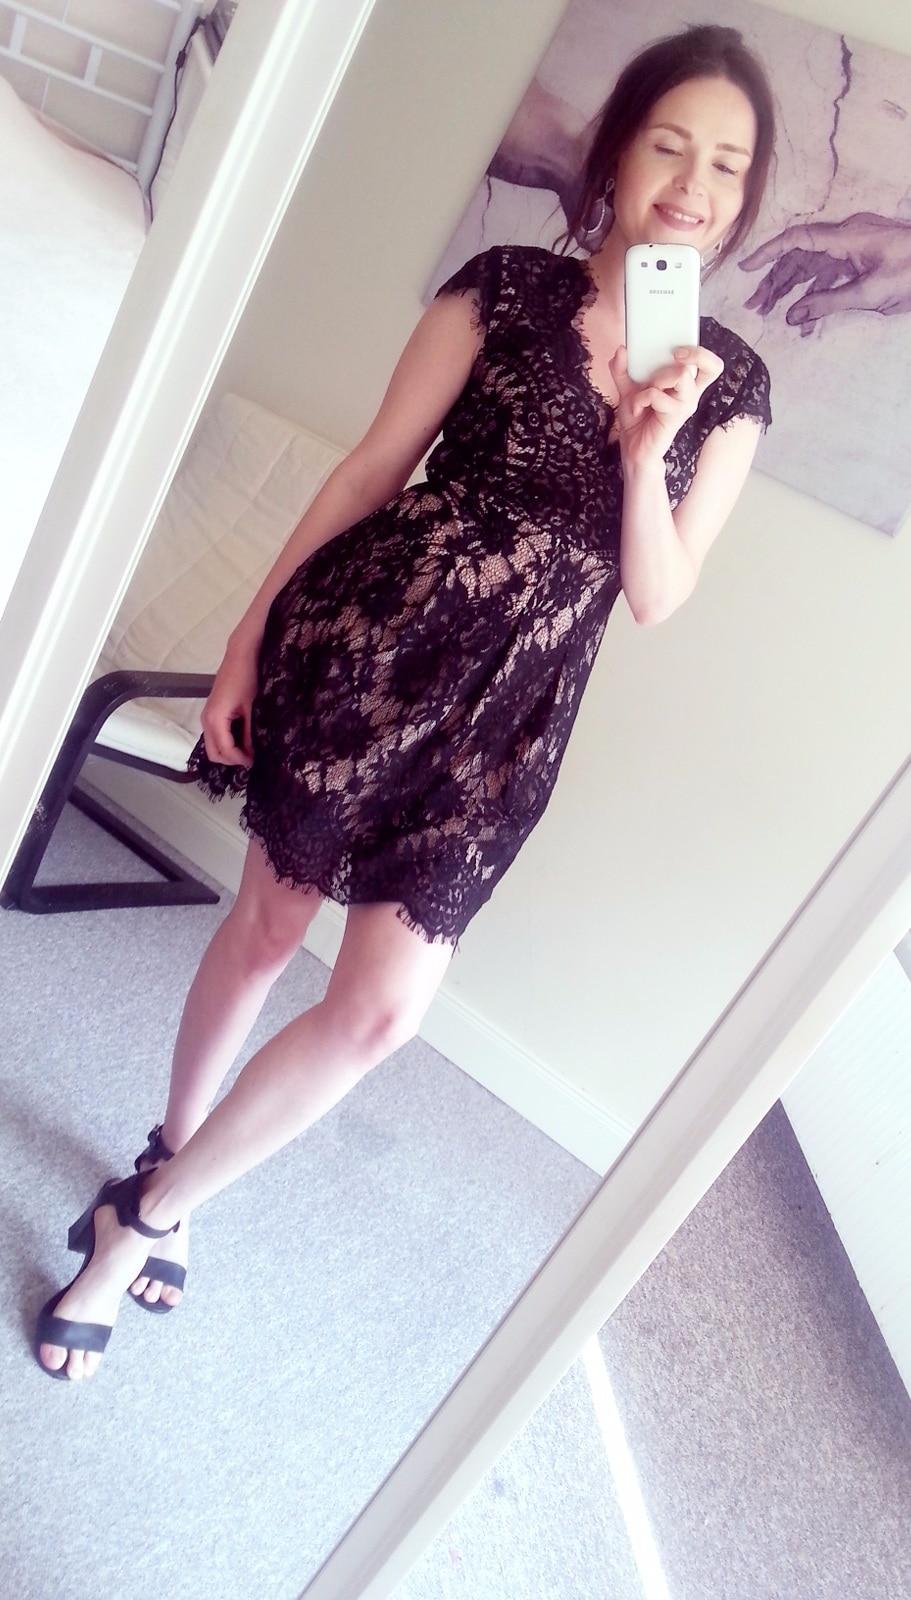 COLROVE Balck Bodycon Vestidos 2016 Summer Dresses Sexy Girls Cap Sleeve Deep V Neck Elegant Women Above Knee Lace Dress